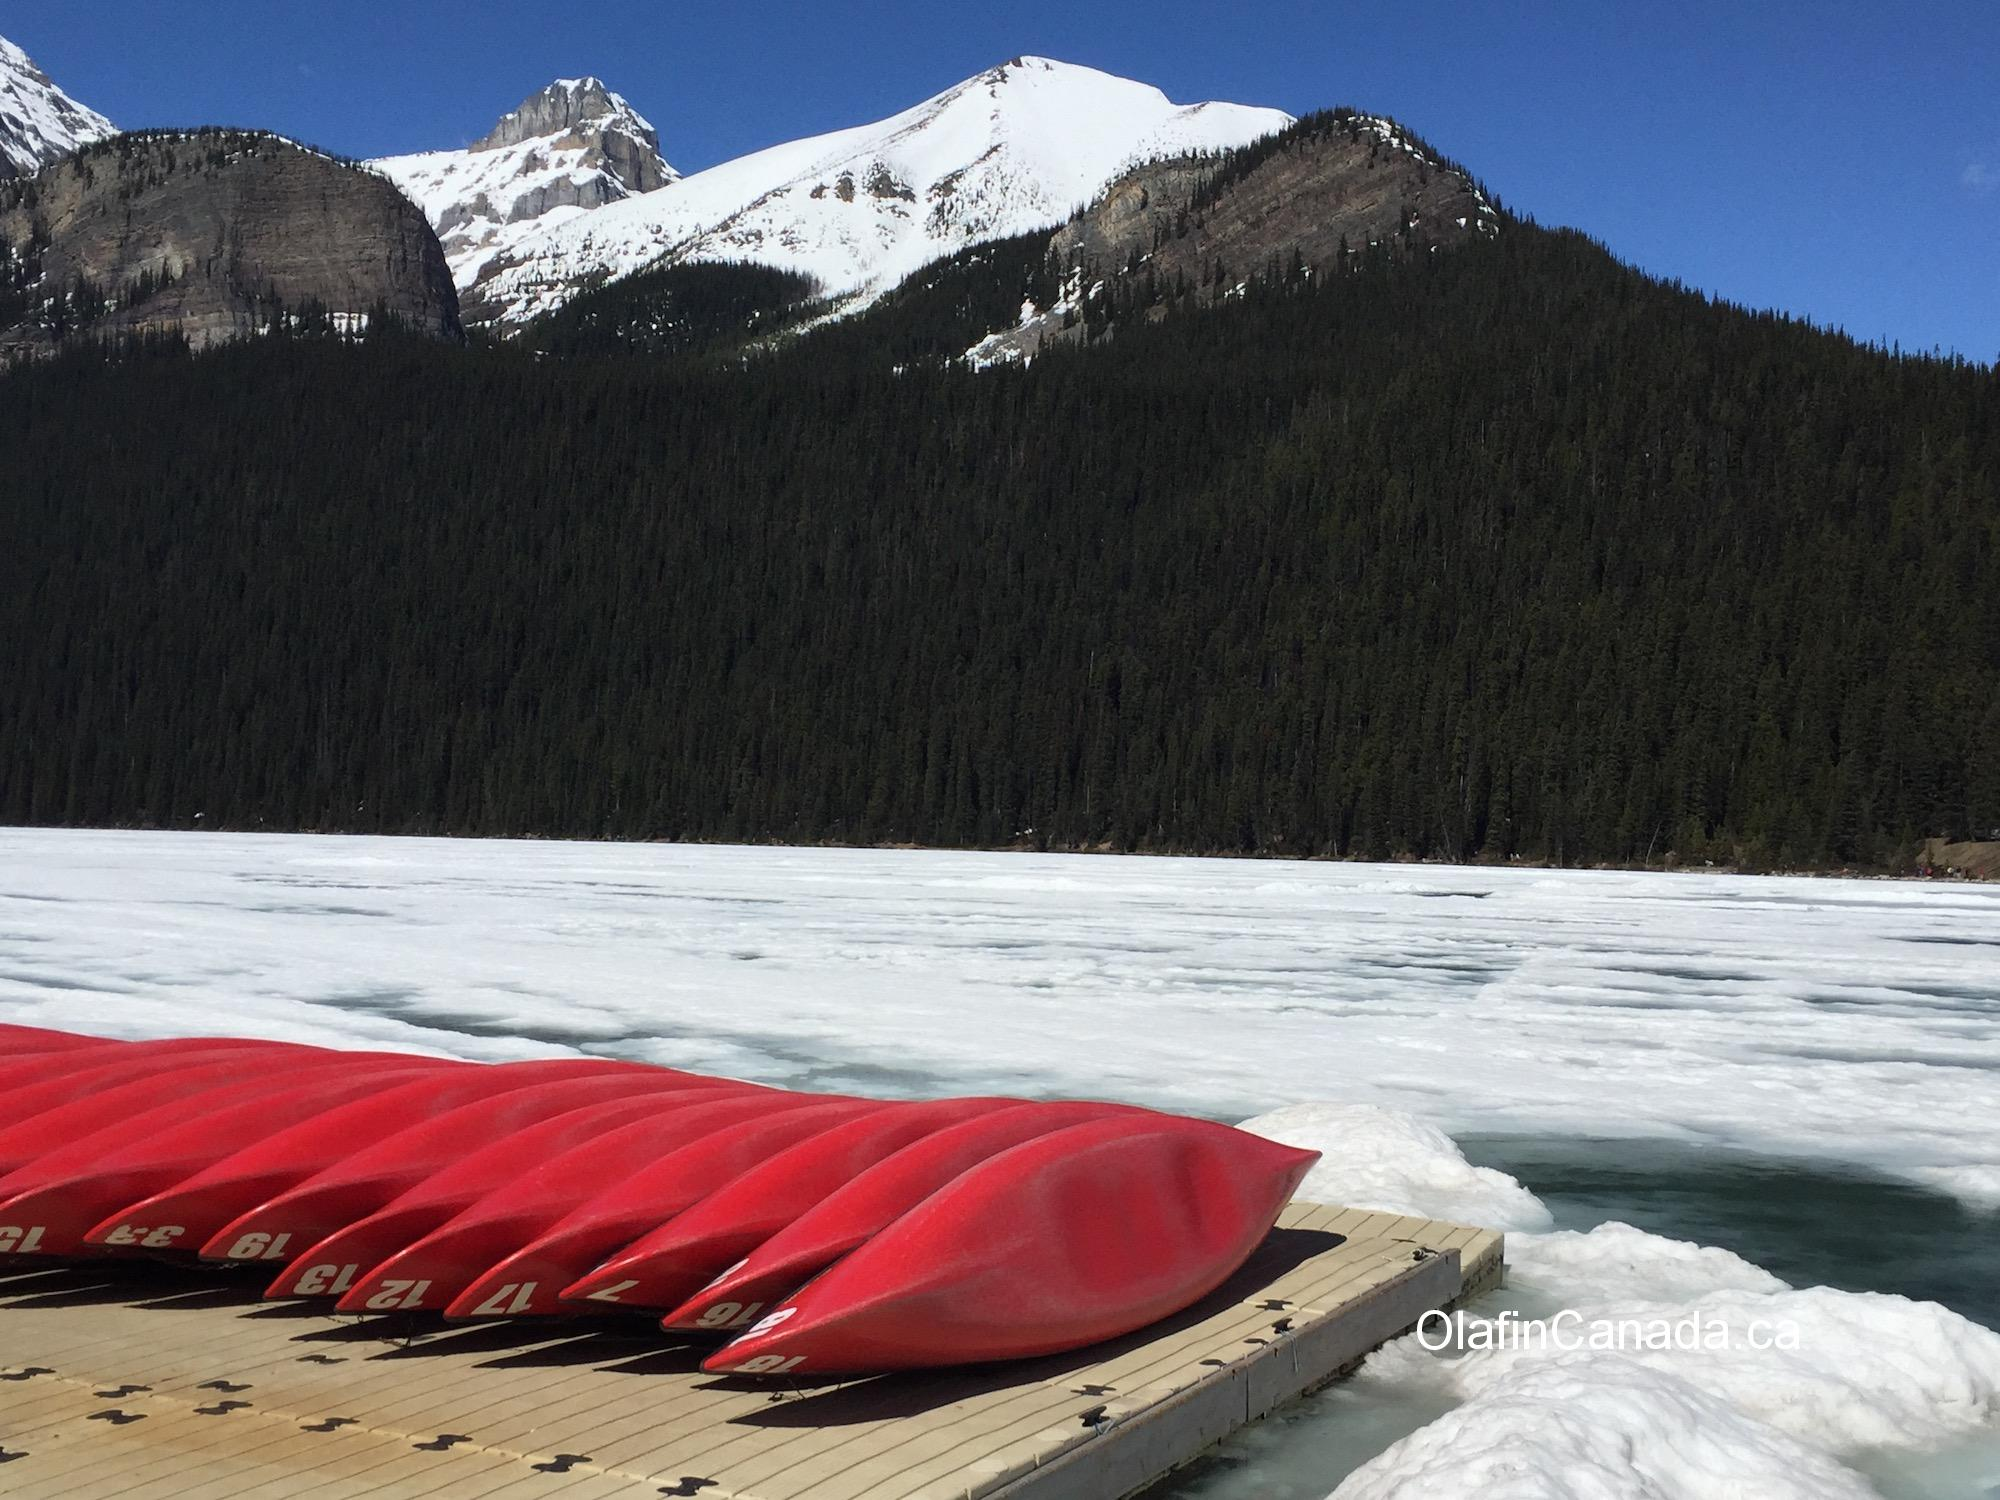 Kayaking in Lake Louise #olafincanada #alberta #rockies #lakelouise